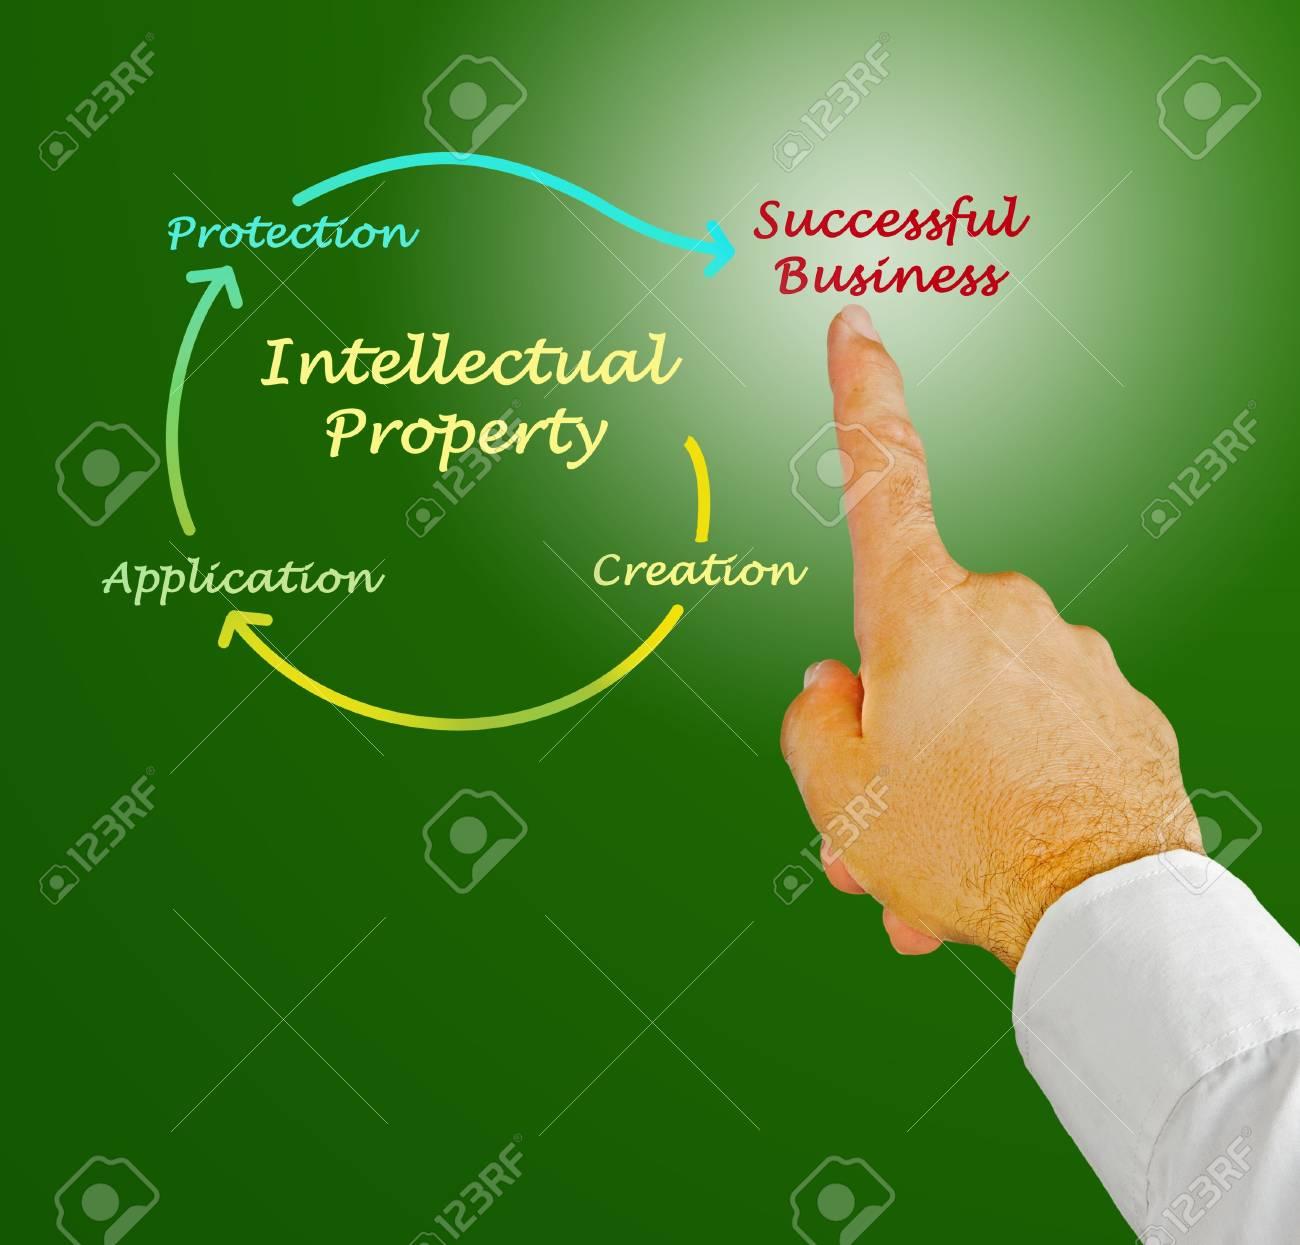 Intellectual property diagram Stock Photo - 19604938